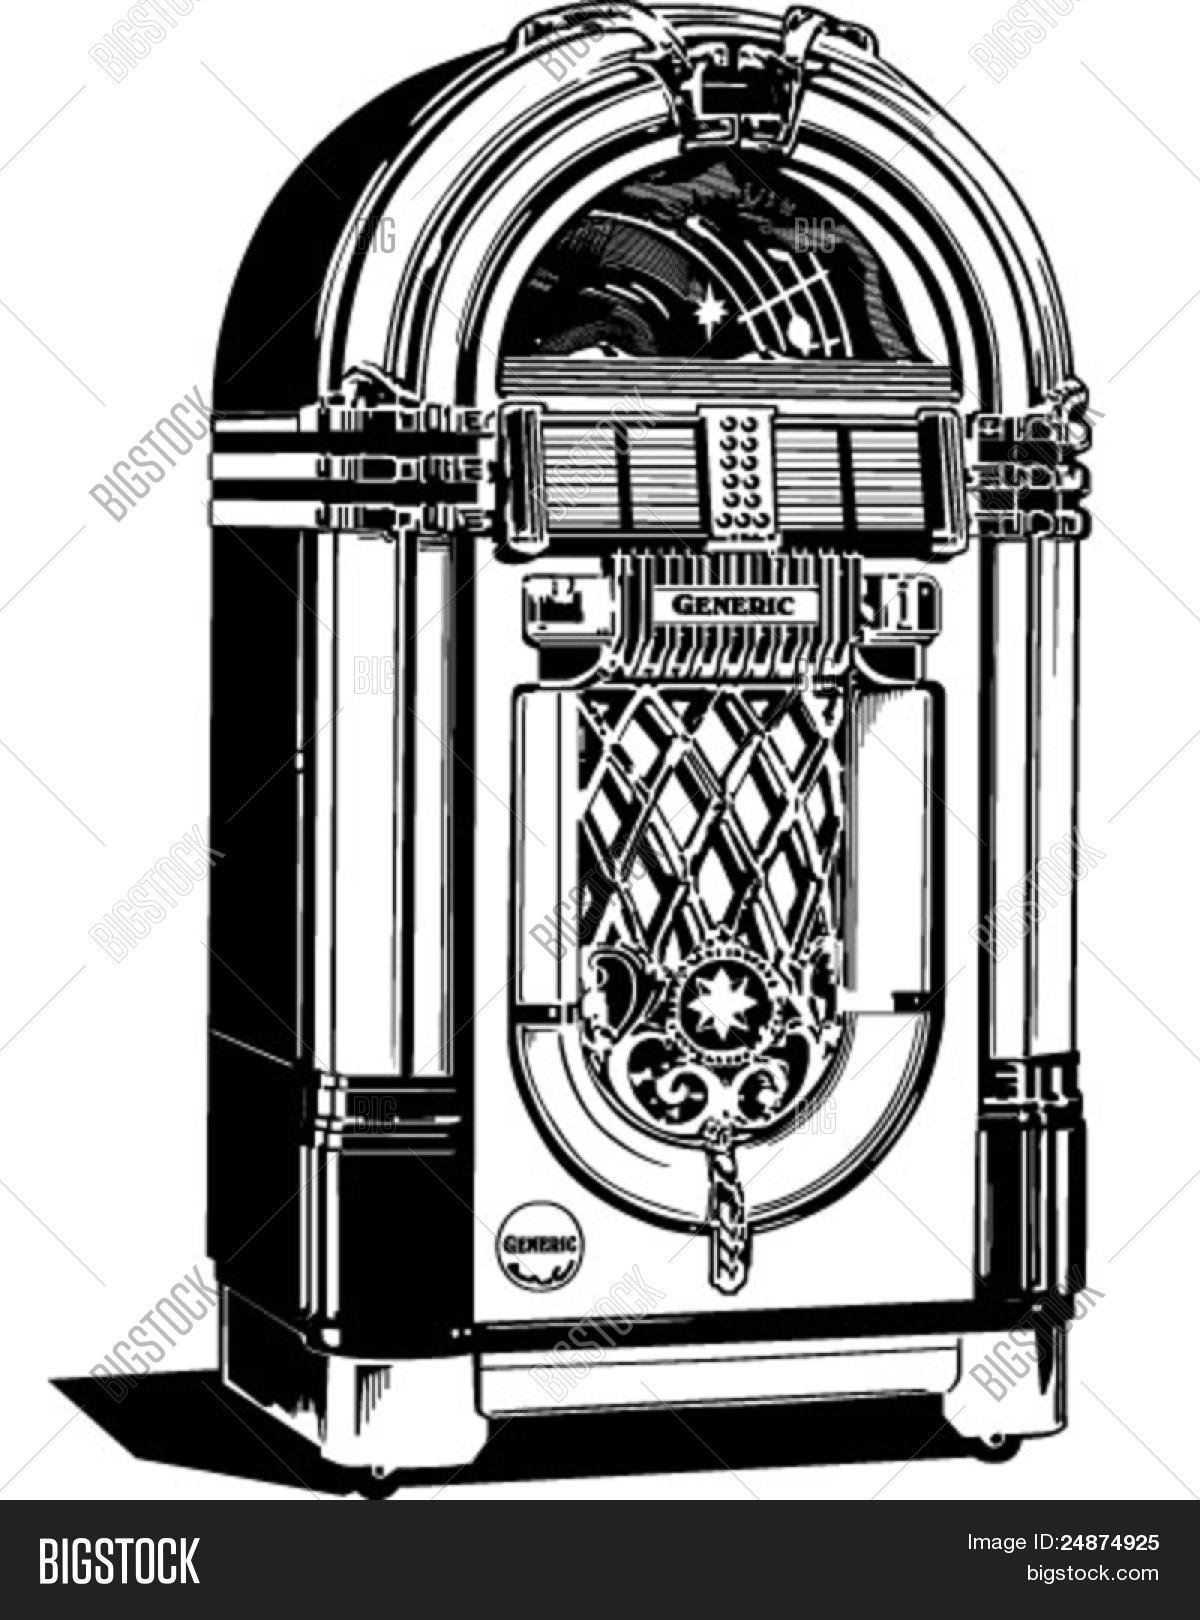 hight resolution of jukebox 1 retro clipart illustration